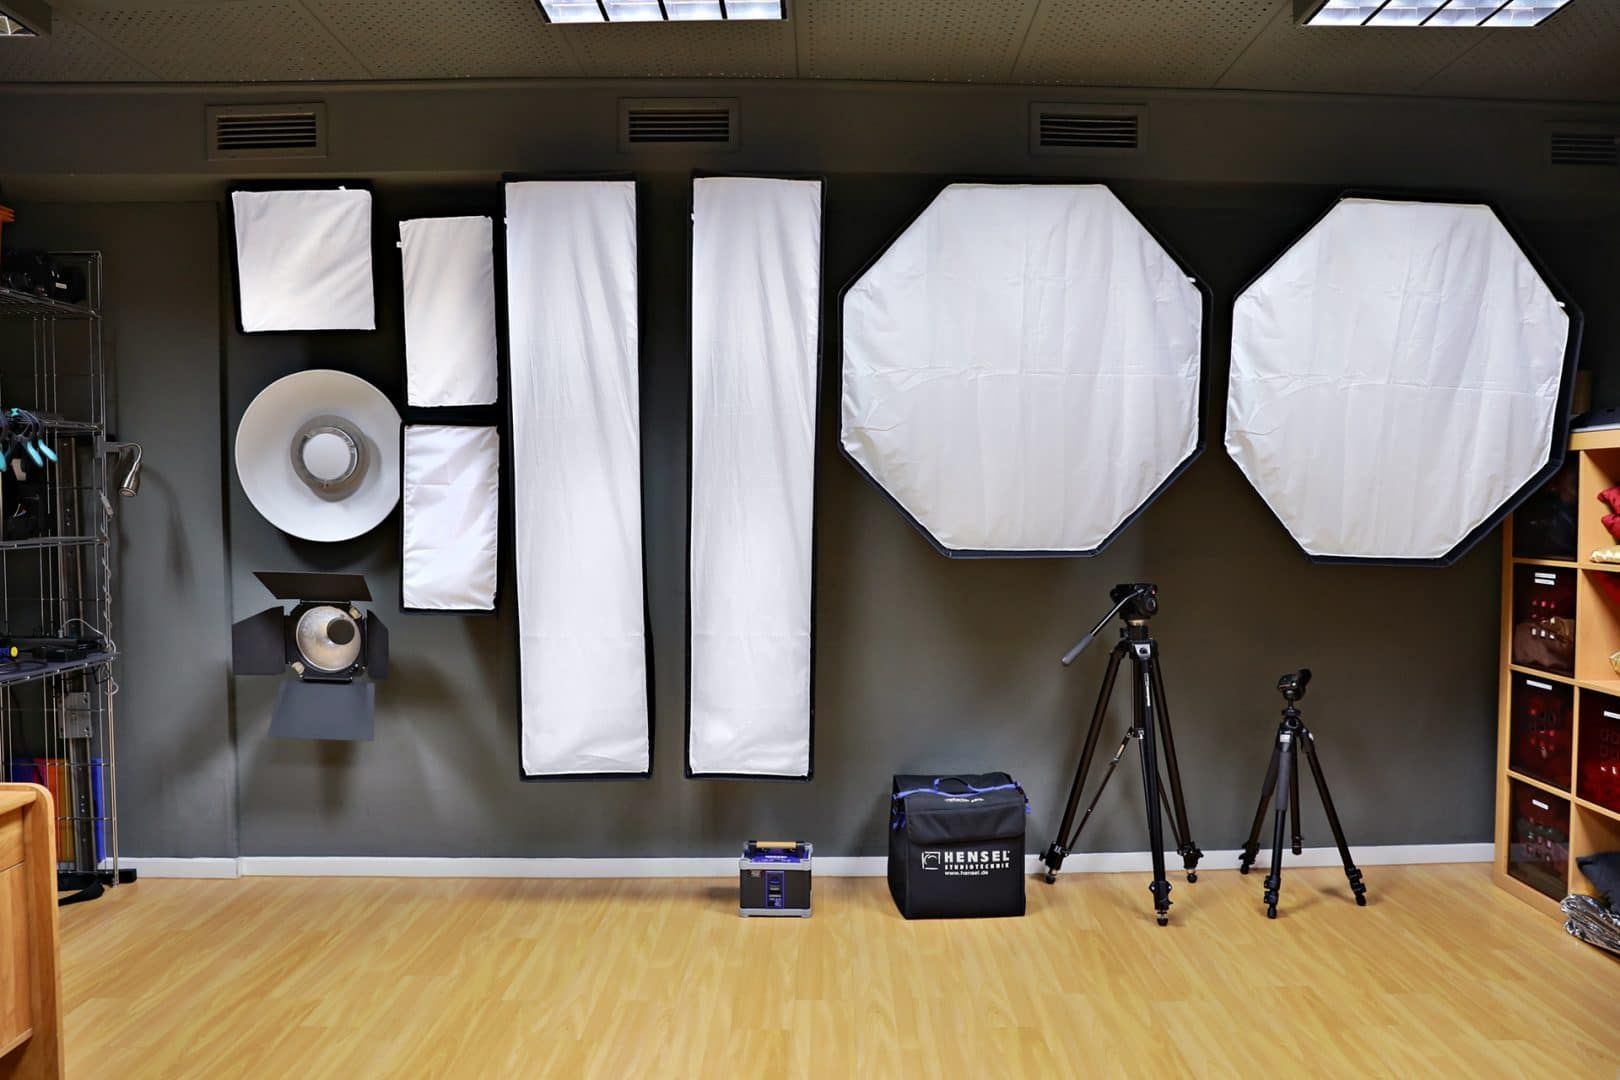 Softboxen Fur Die Beleuchtung Im Atelier Home Studio Photography Photography Studio Equipment Studio Photography Lighting